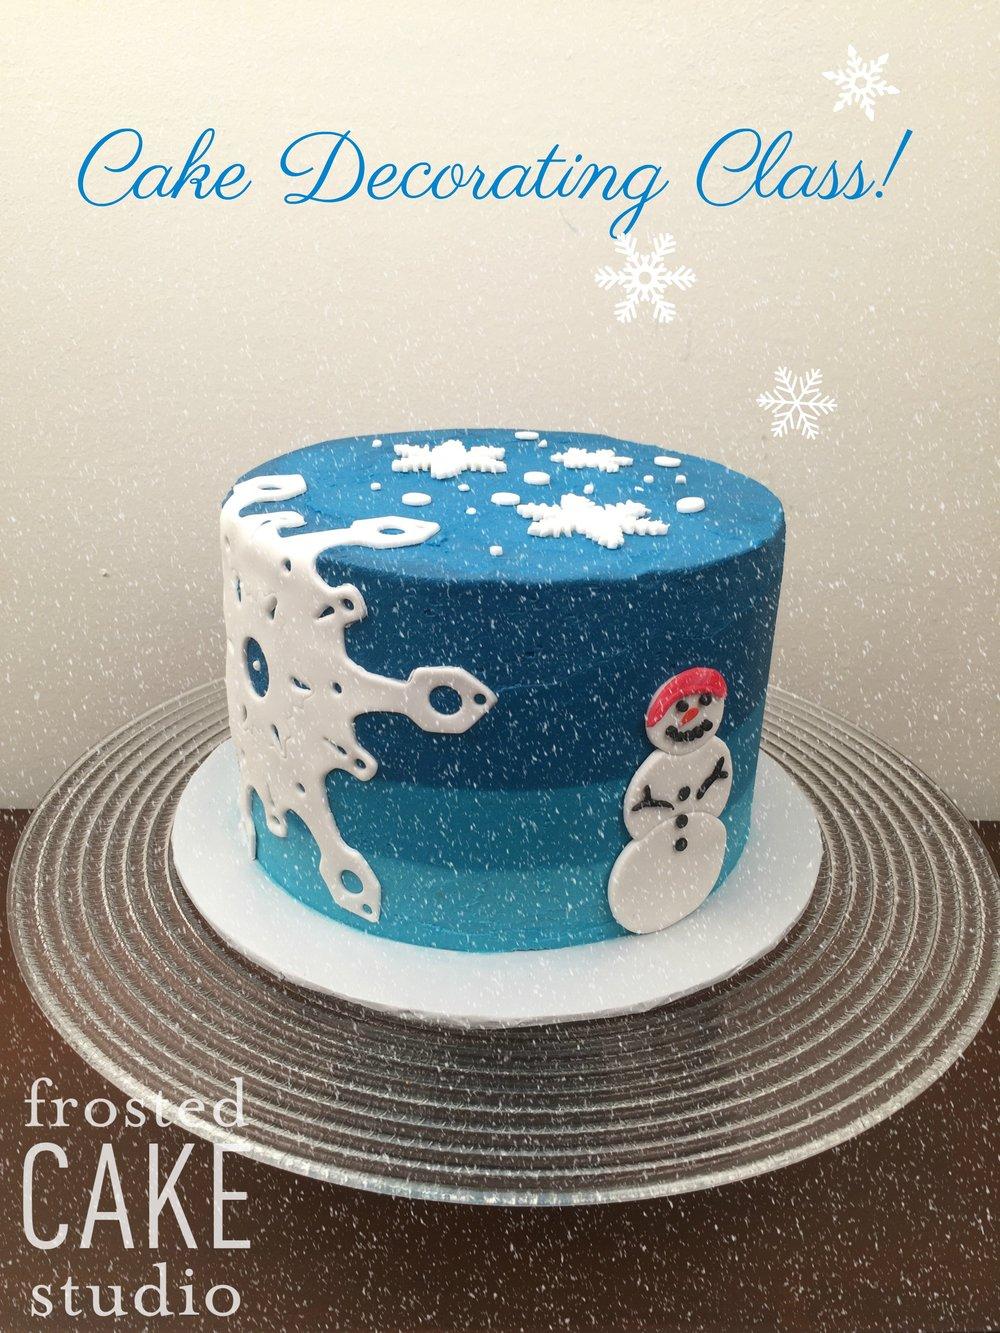 Cake Decorating Class Snowflake Cake Frosted Cake Studio Llc